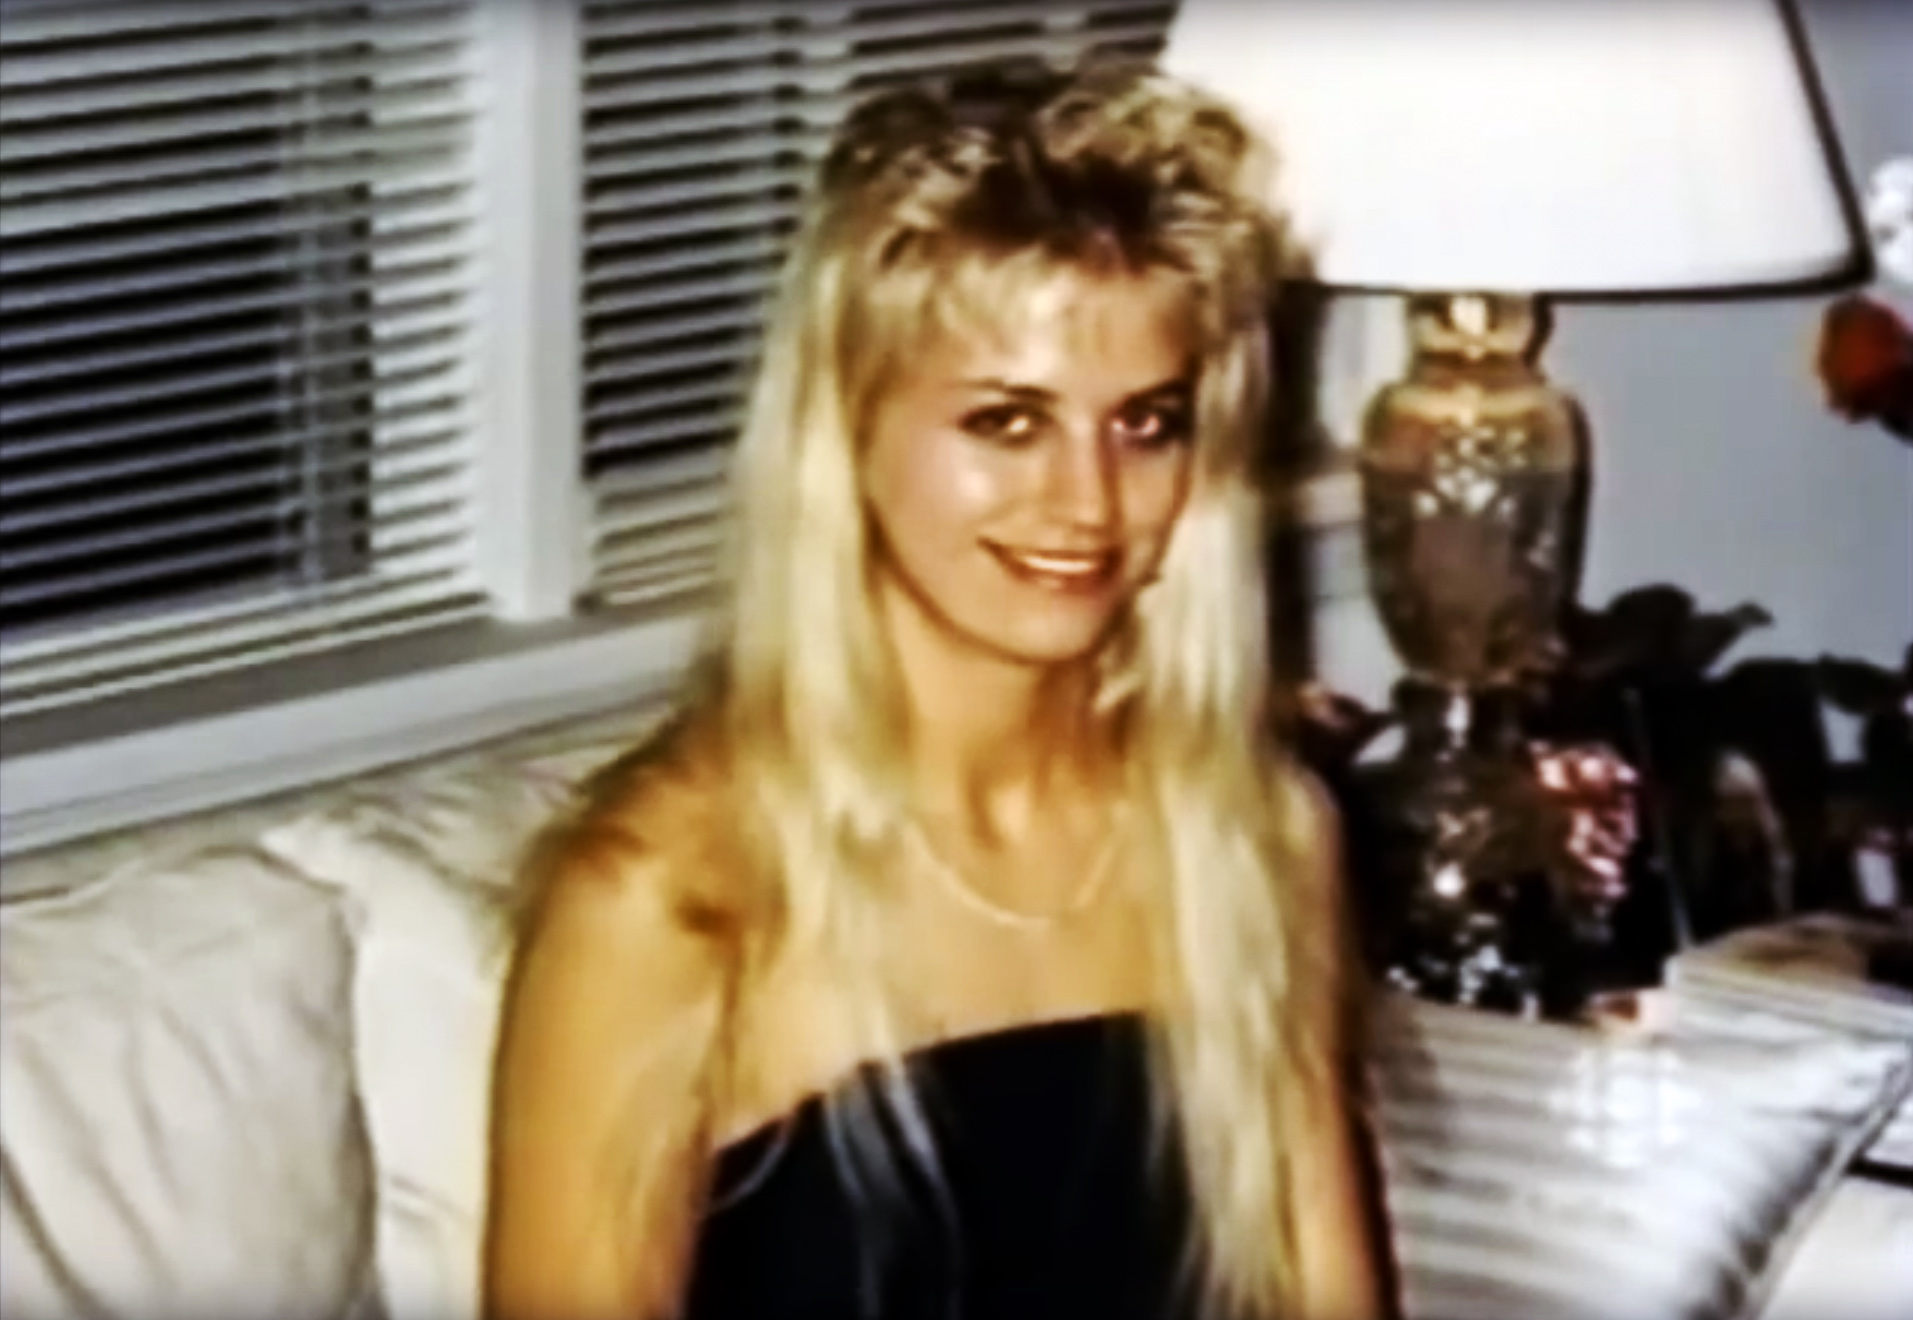 My Sick Obsession: Serial Killer Karla Homolka And Female